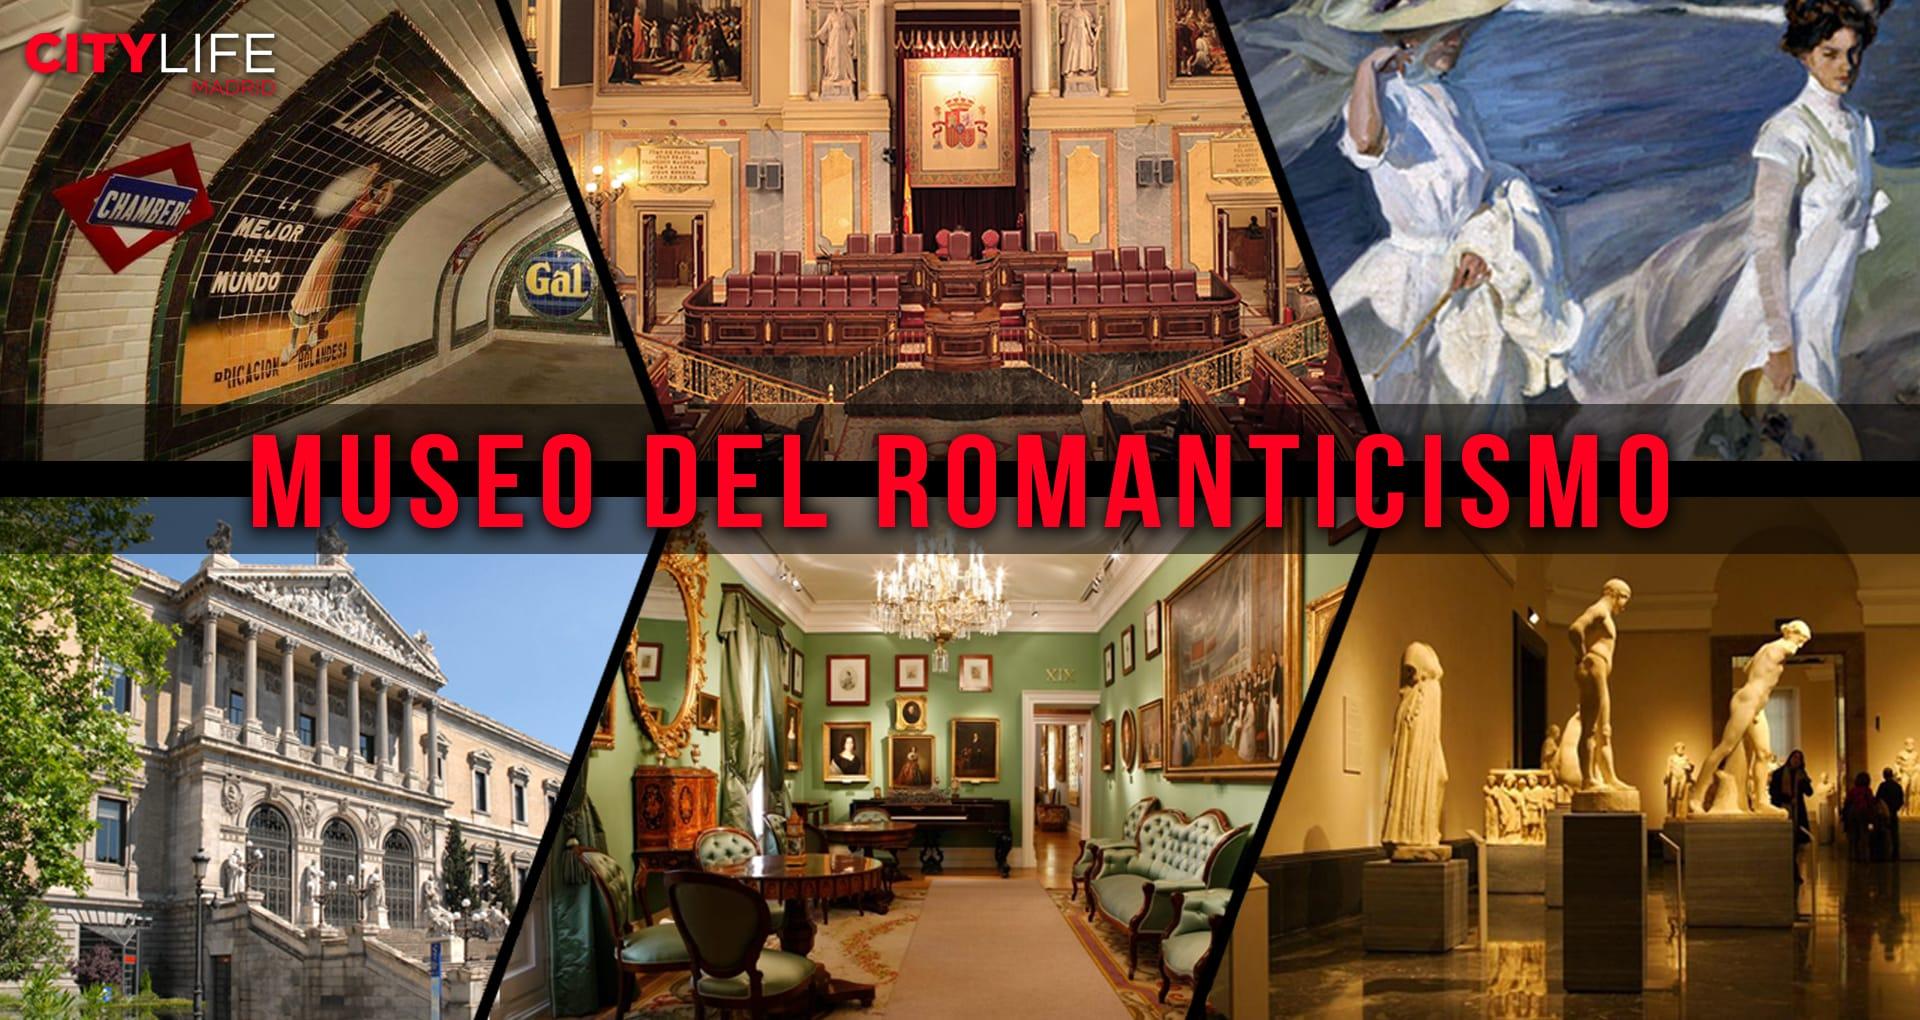 FREE VISIT: MUSEO DEL ROMANTICISMO